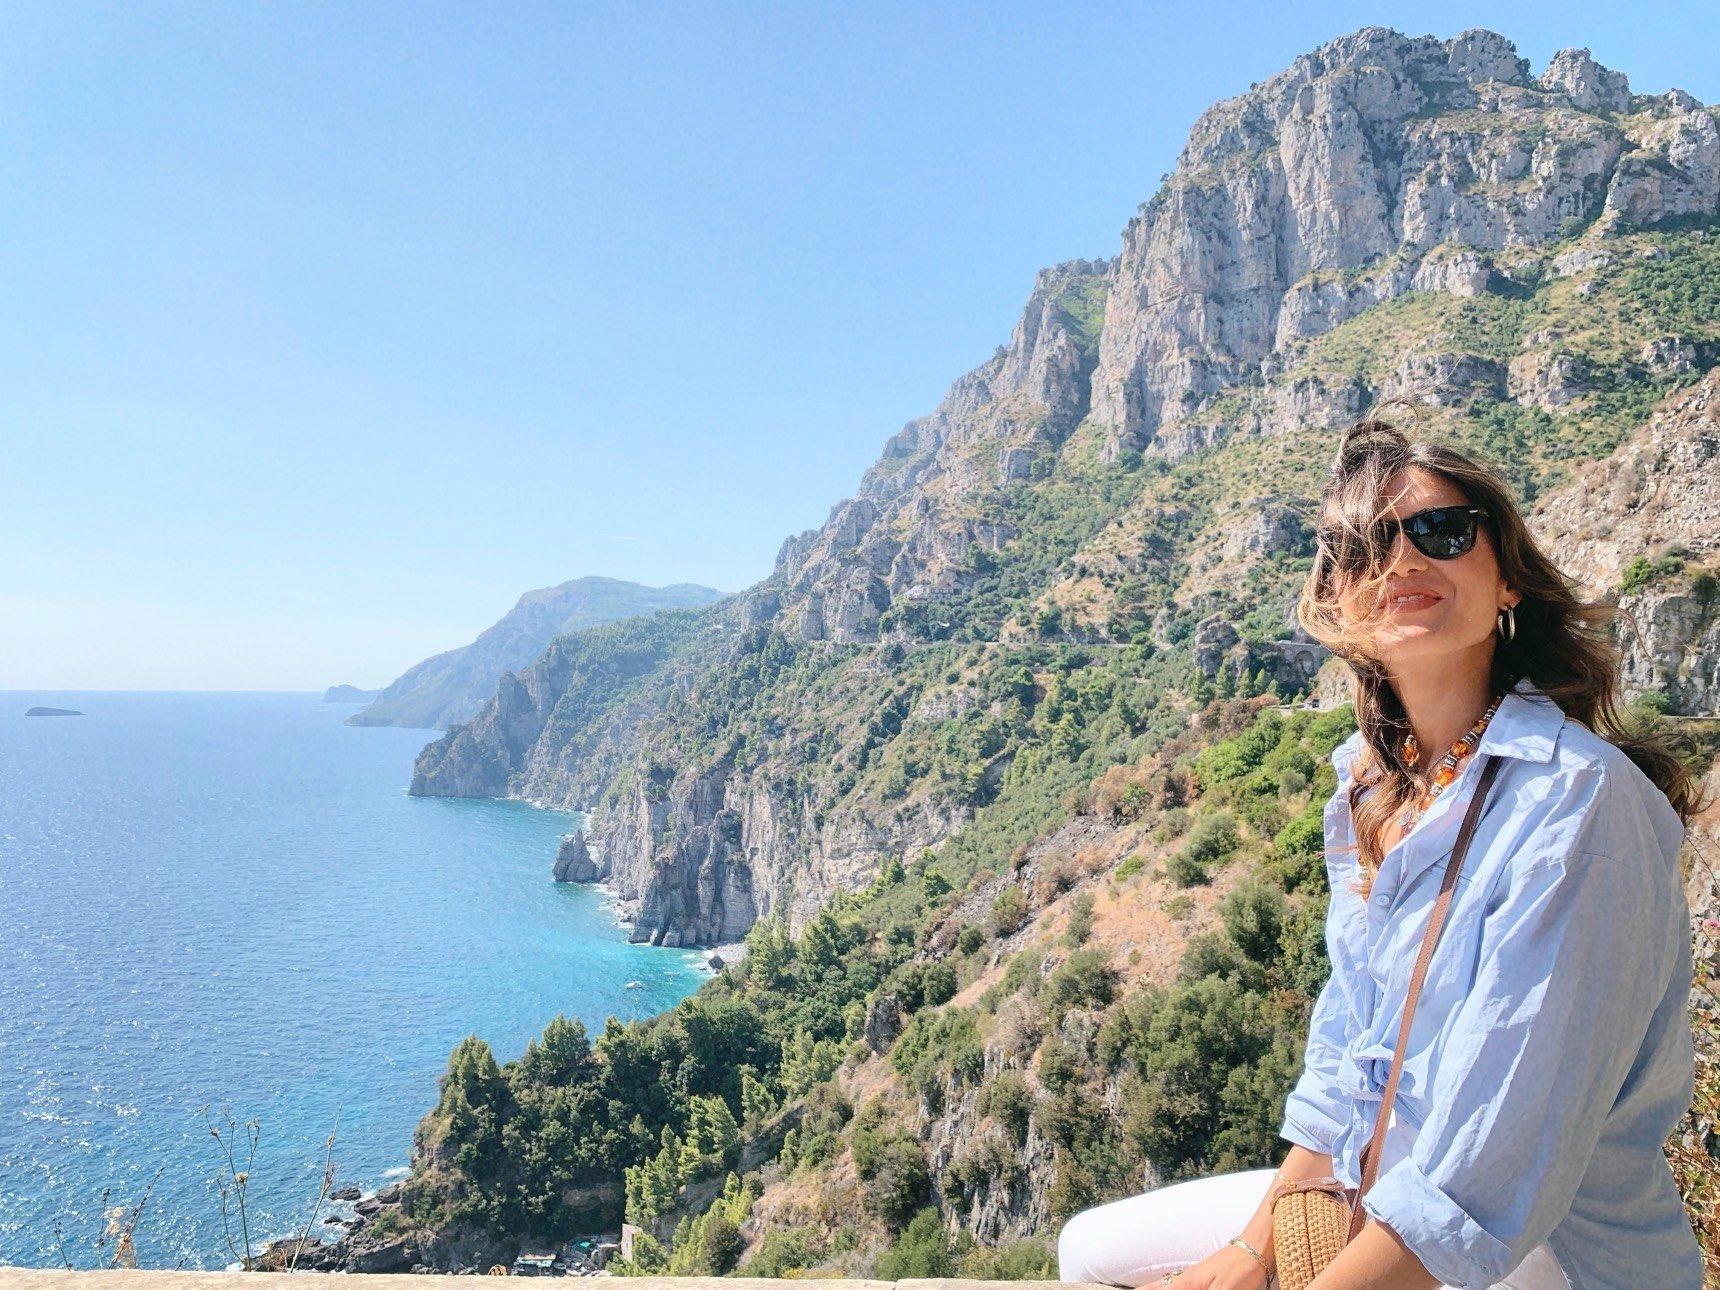 Amalfi Coast tour, viewpoint